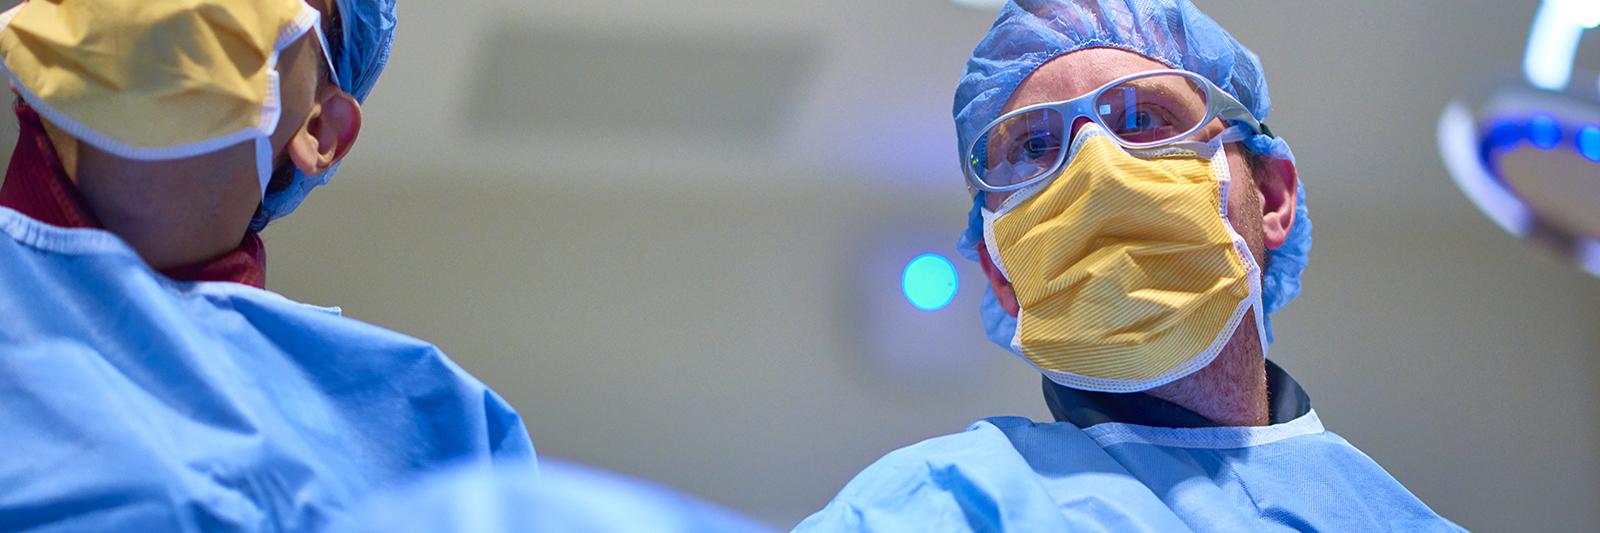 General Surgery Northeast Residency